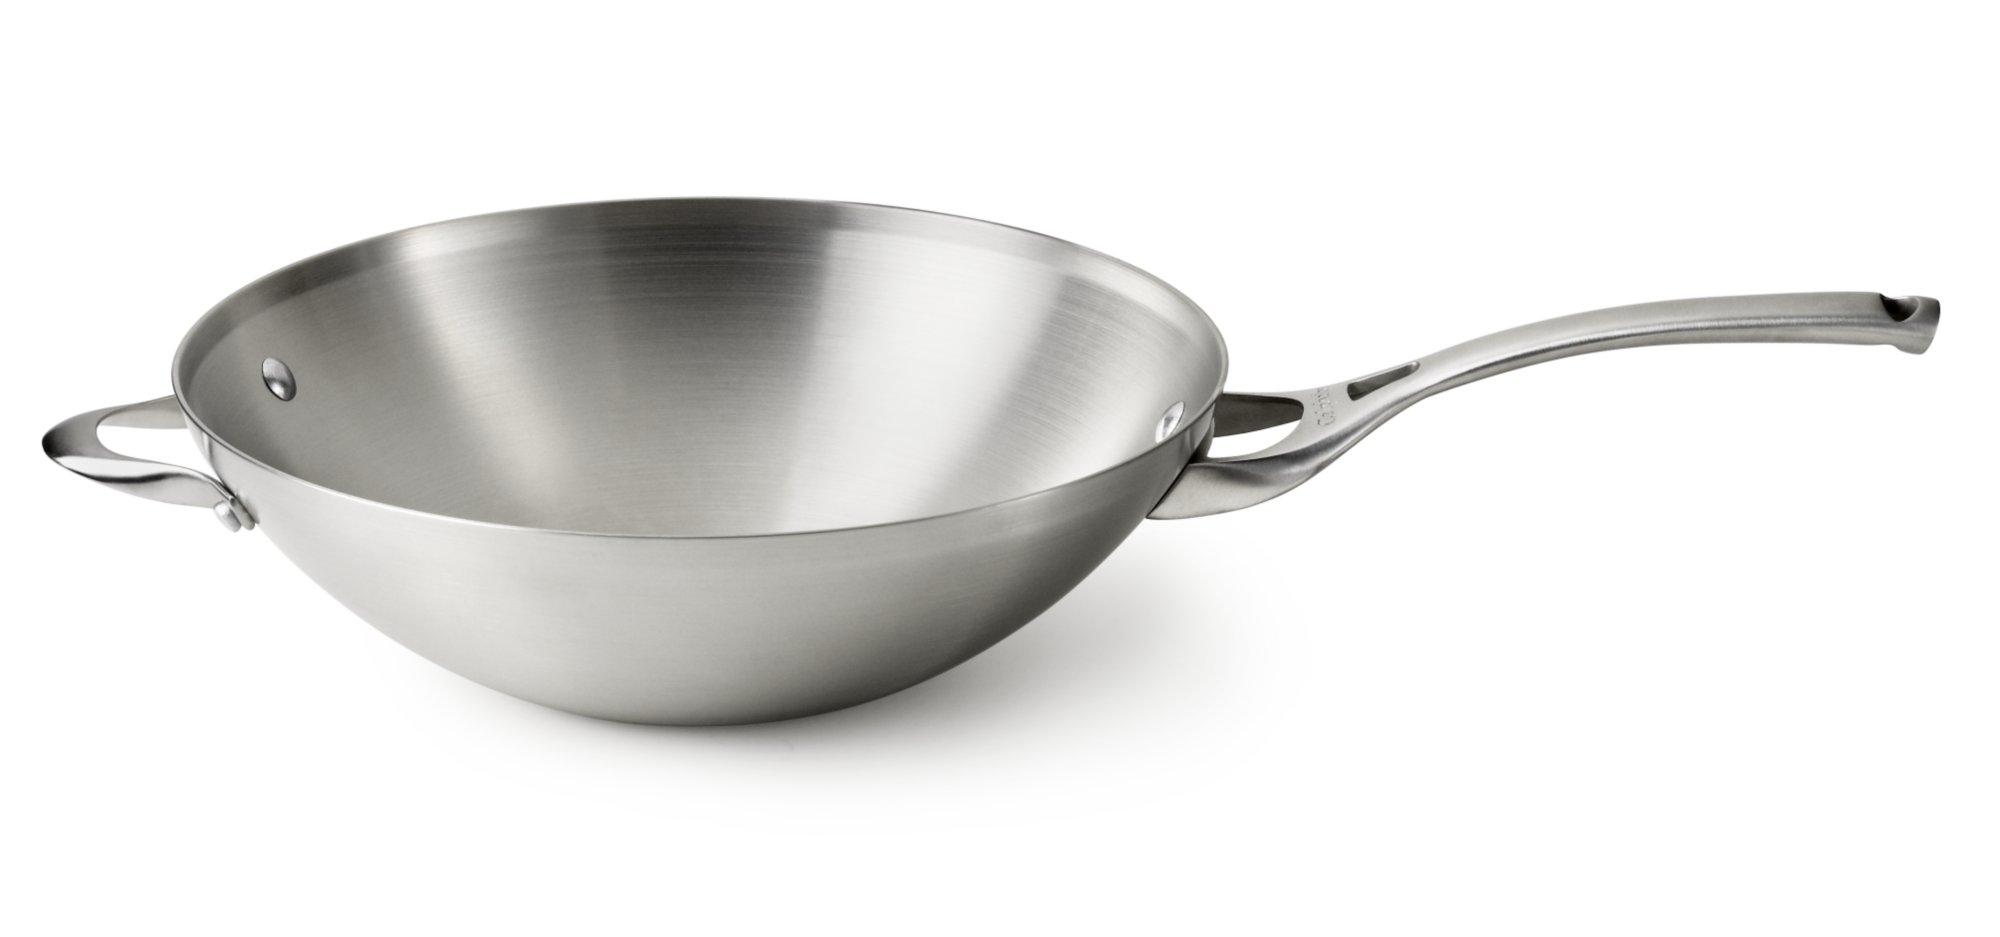 Woks Stiry Fry Pans